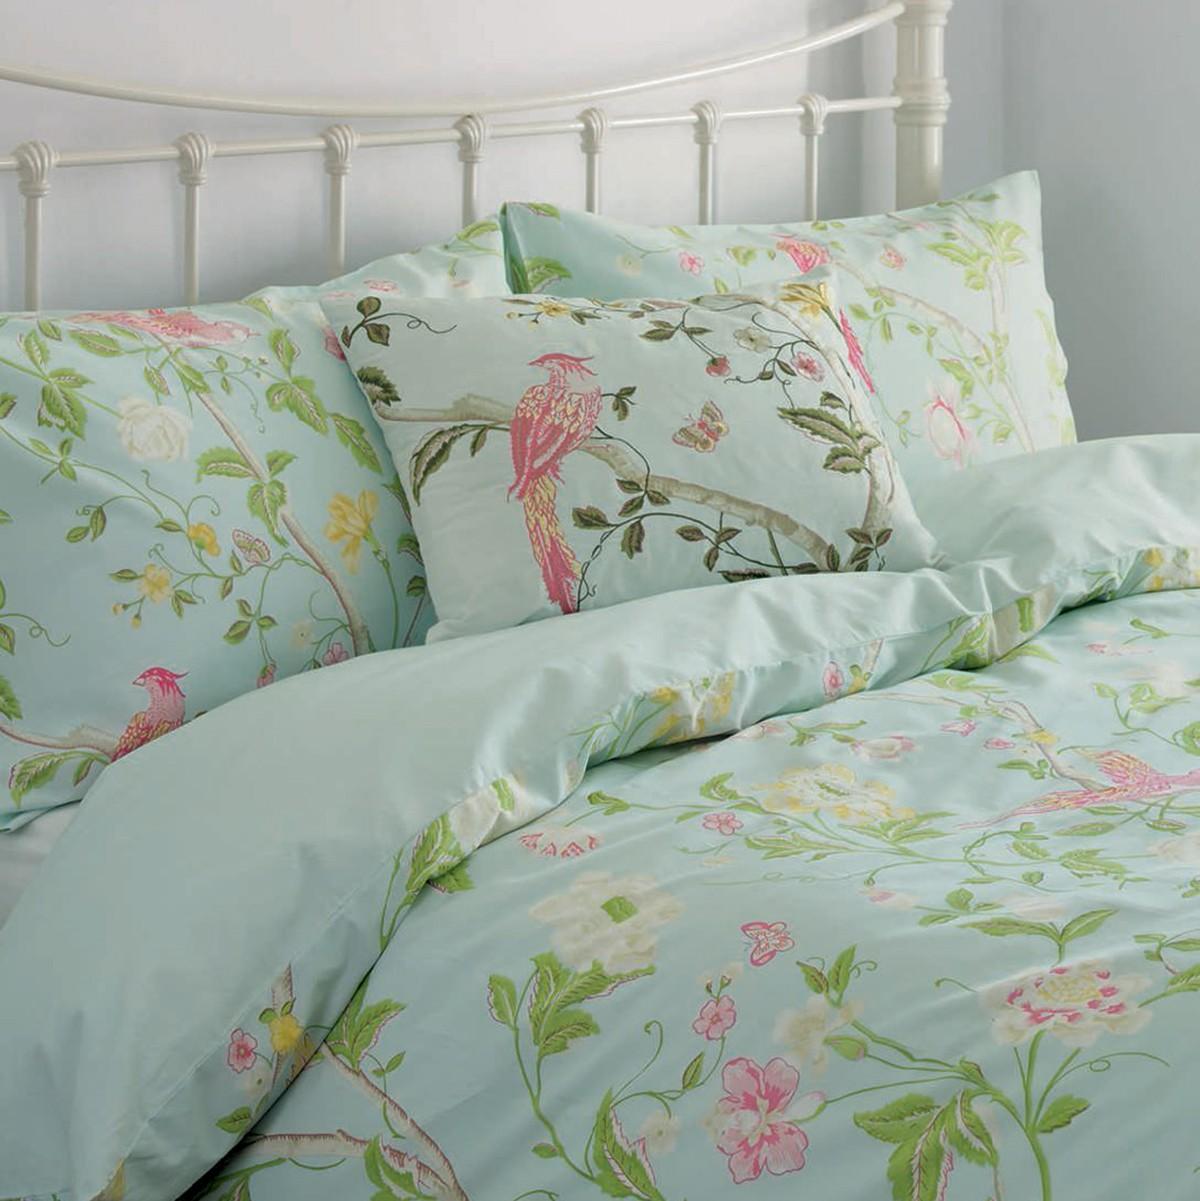 laura ashley summer palace. Black Bedroom Furniture Sets. Home Design Ideas